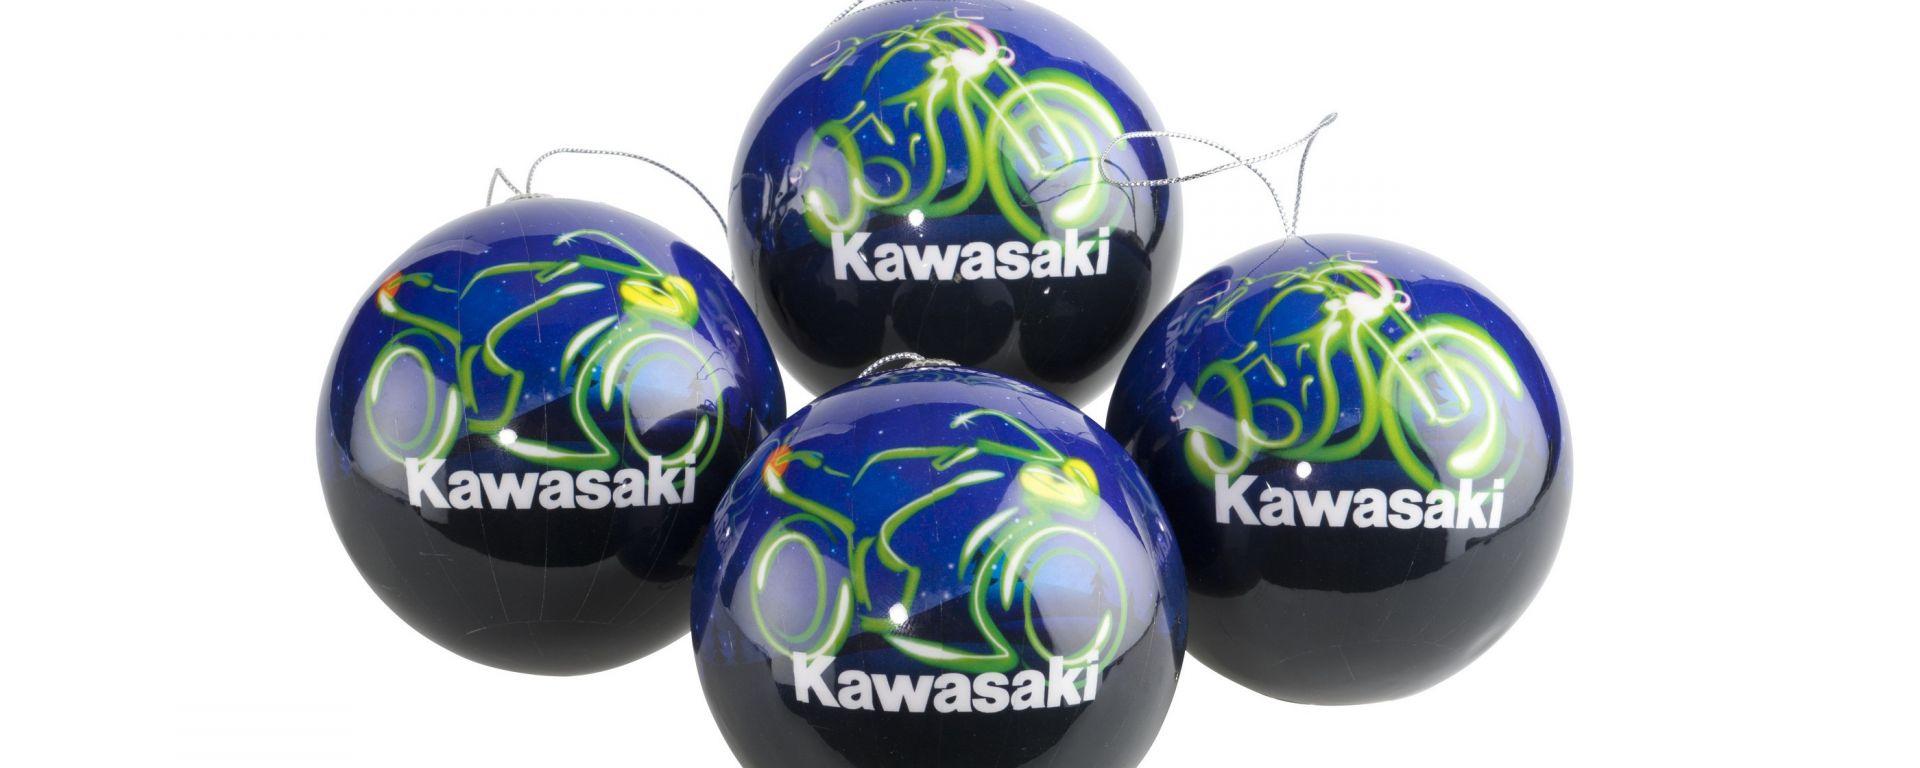 Idee regalo: le proposte Kawasaki